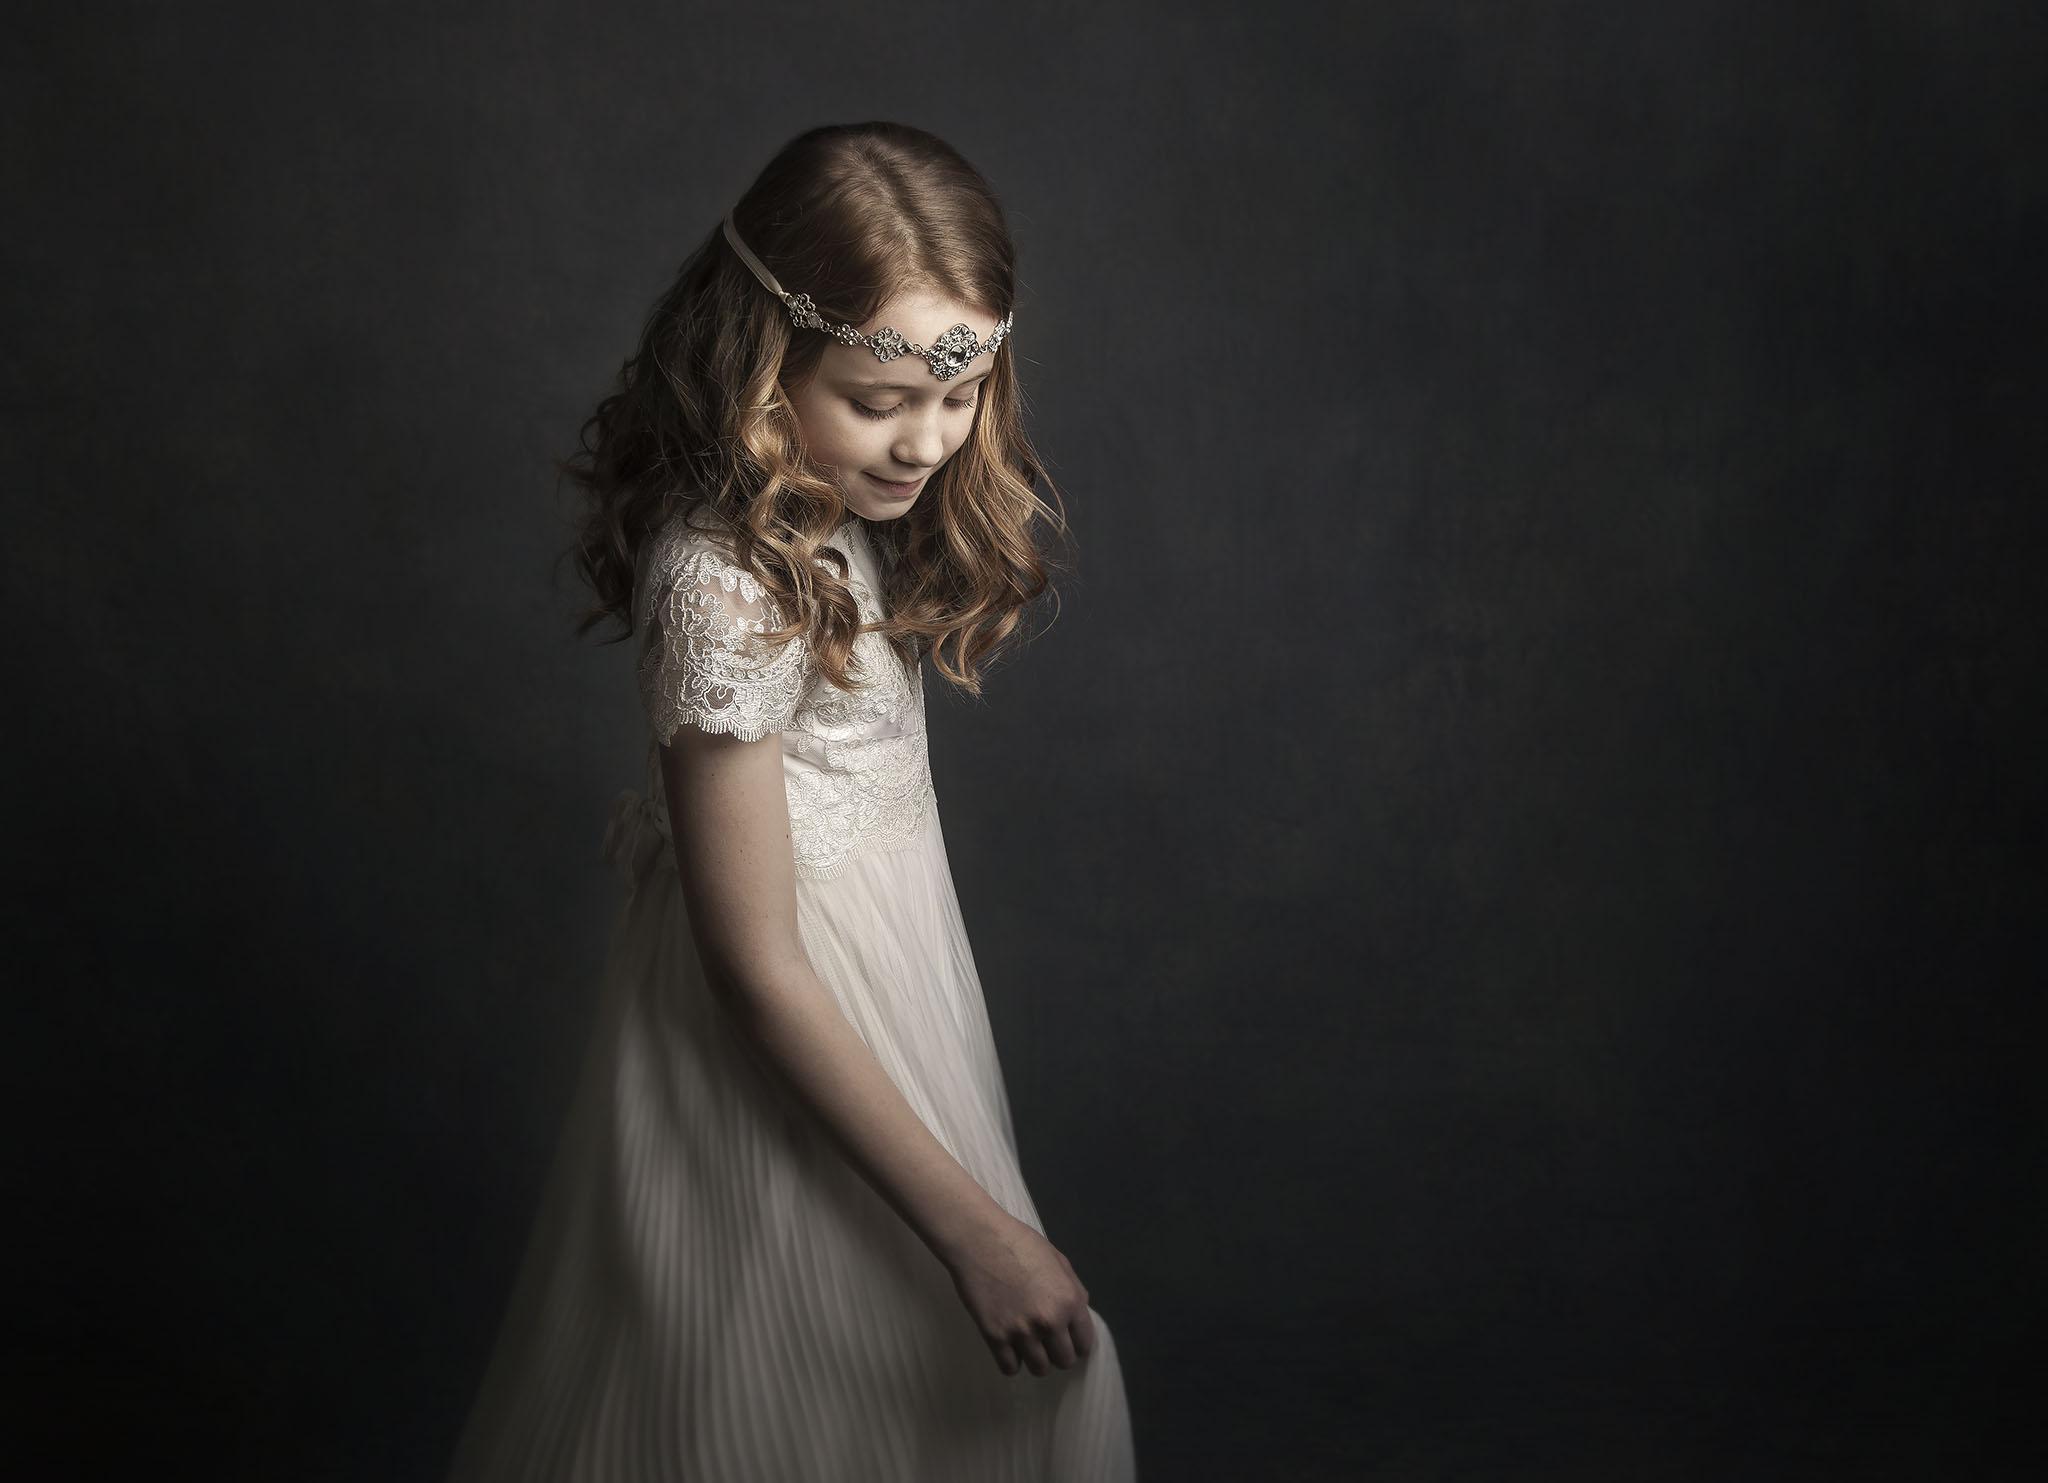 elizabethgphotography_kingslangley_hertfordshire_fineart_childrens_photography_46.jpg